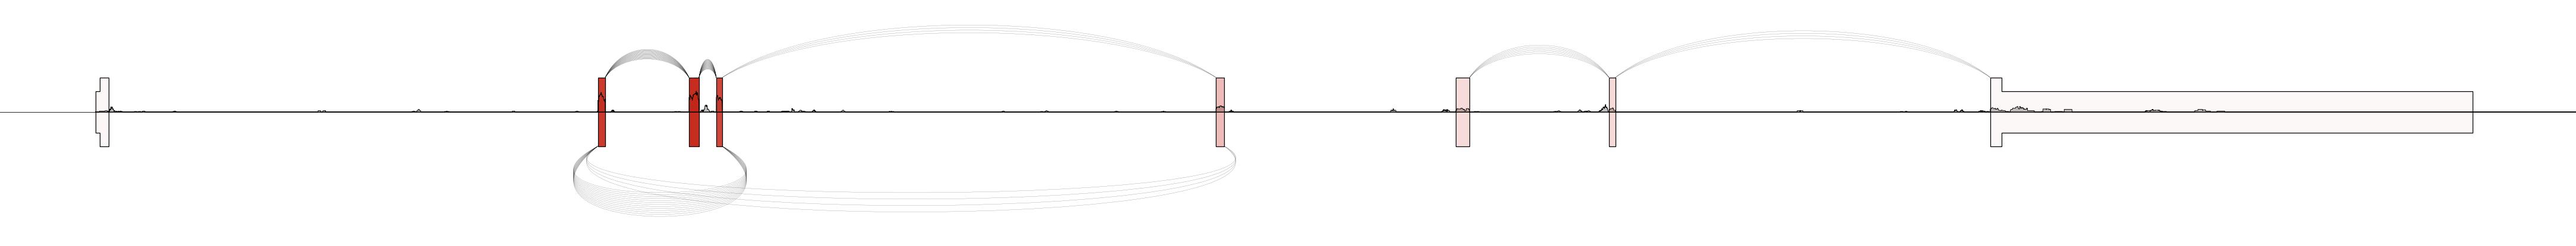 User example plot